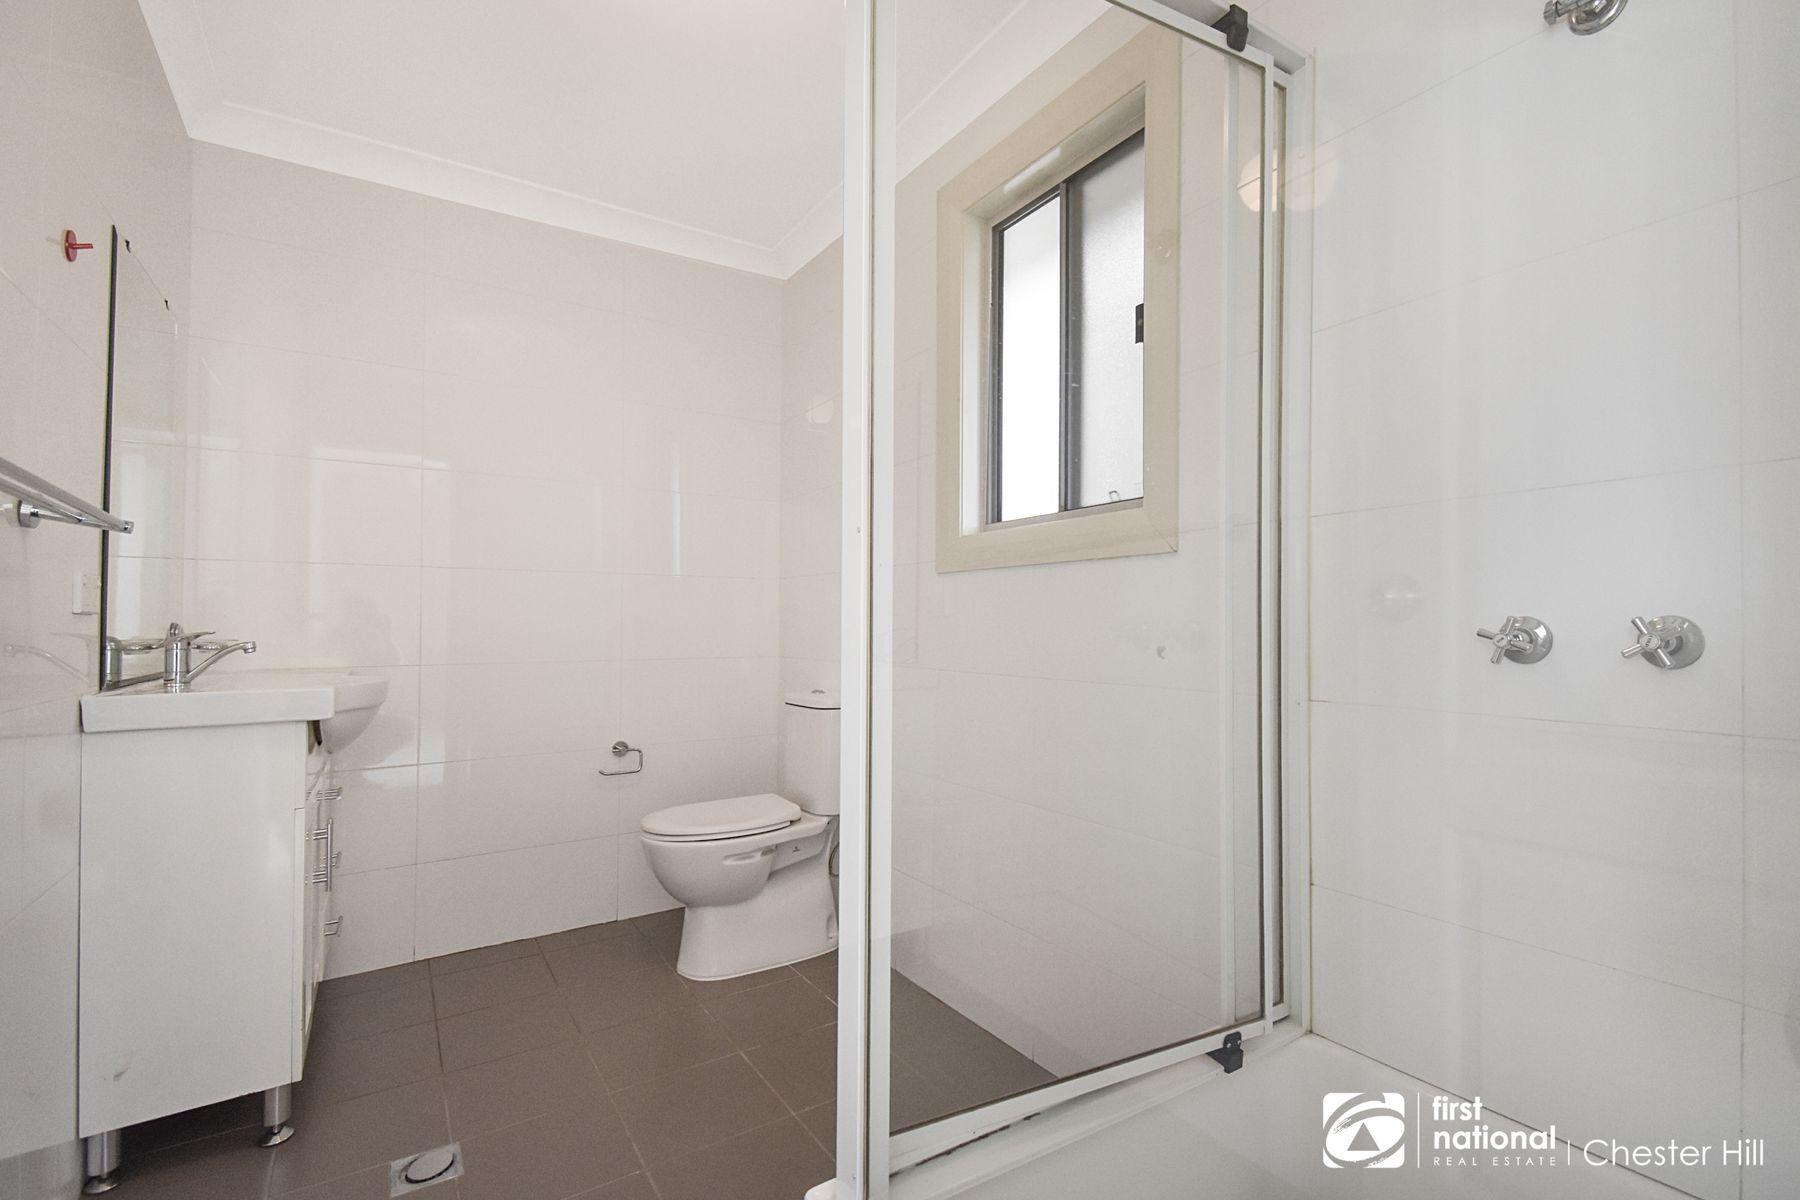 13A Virgil Avenue, Sefton, NSW 2162